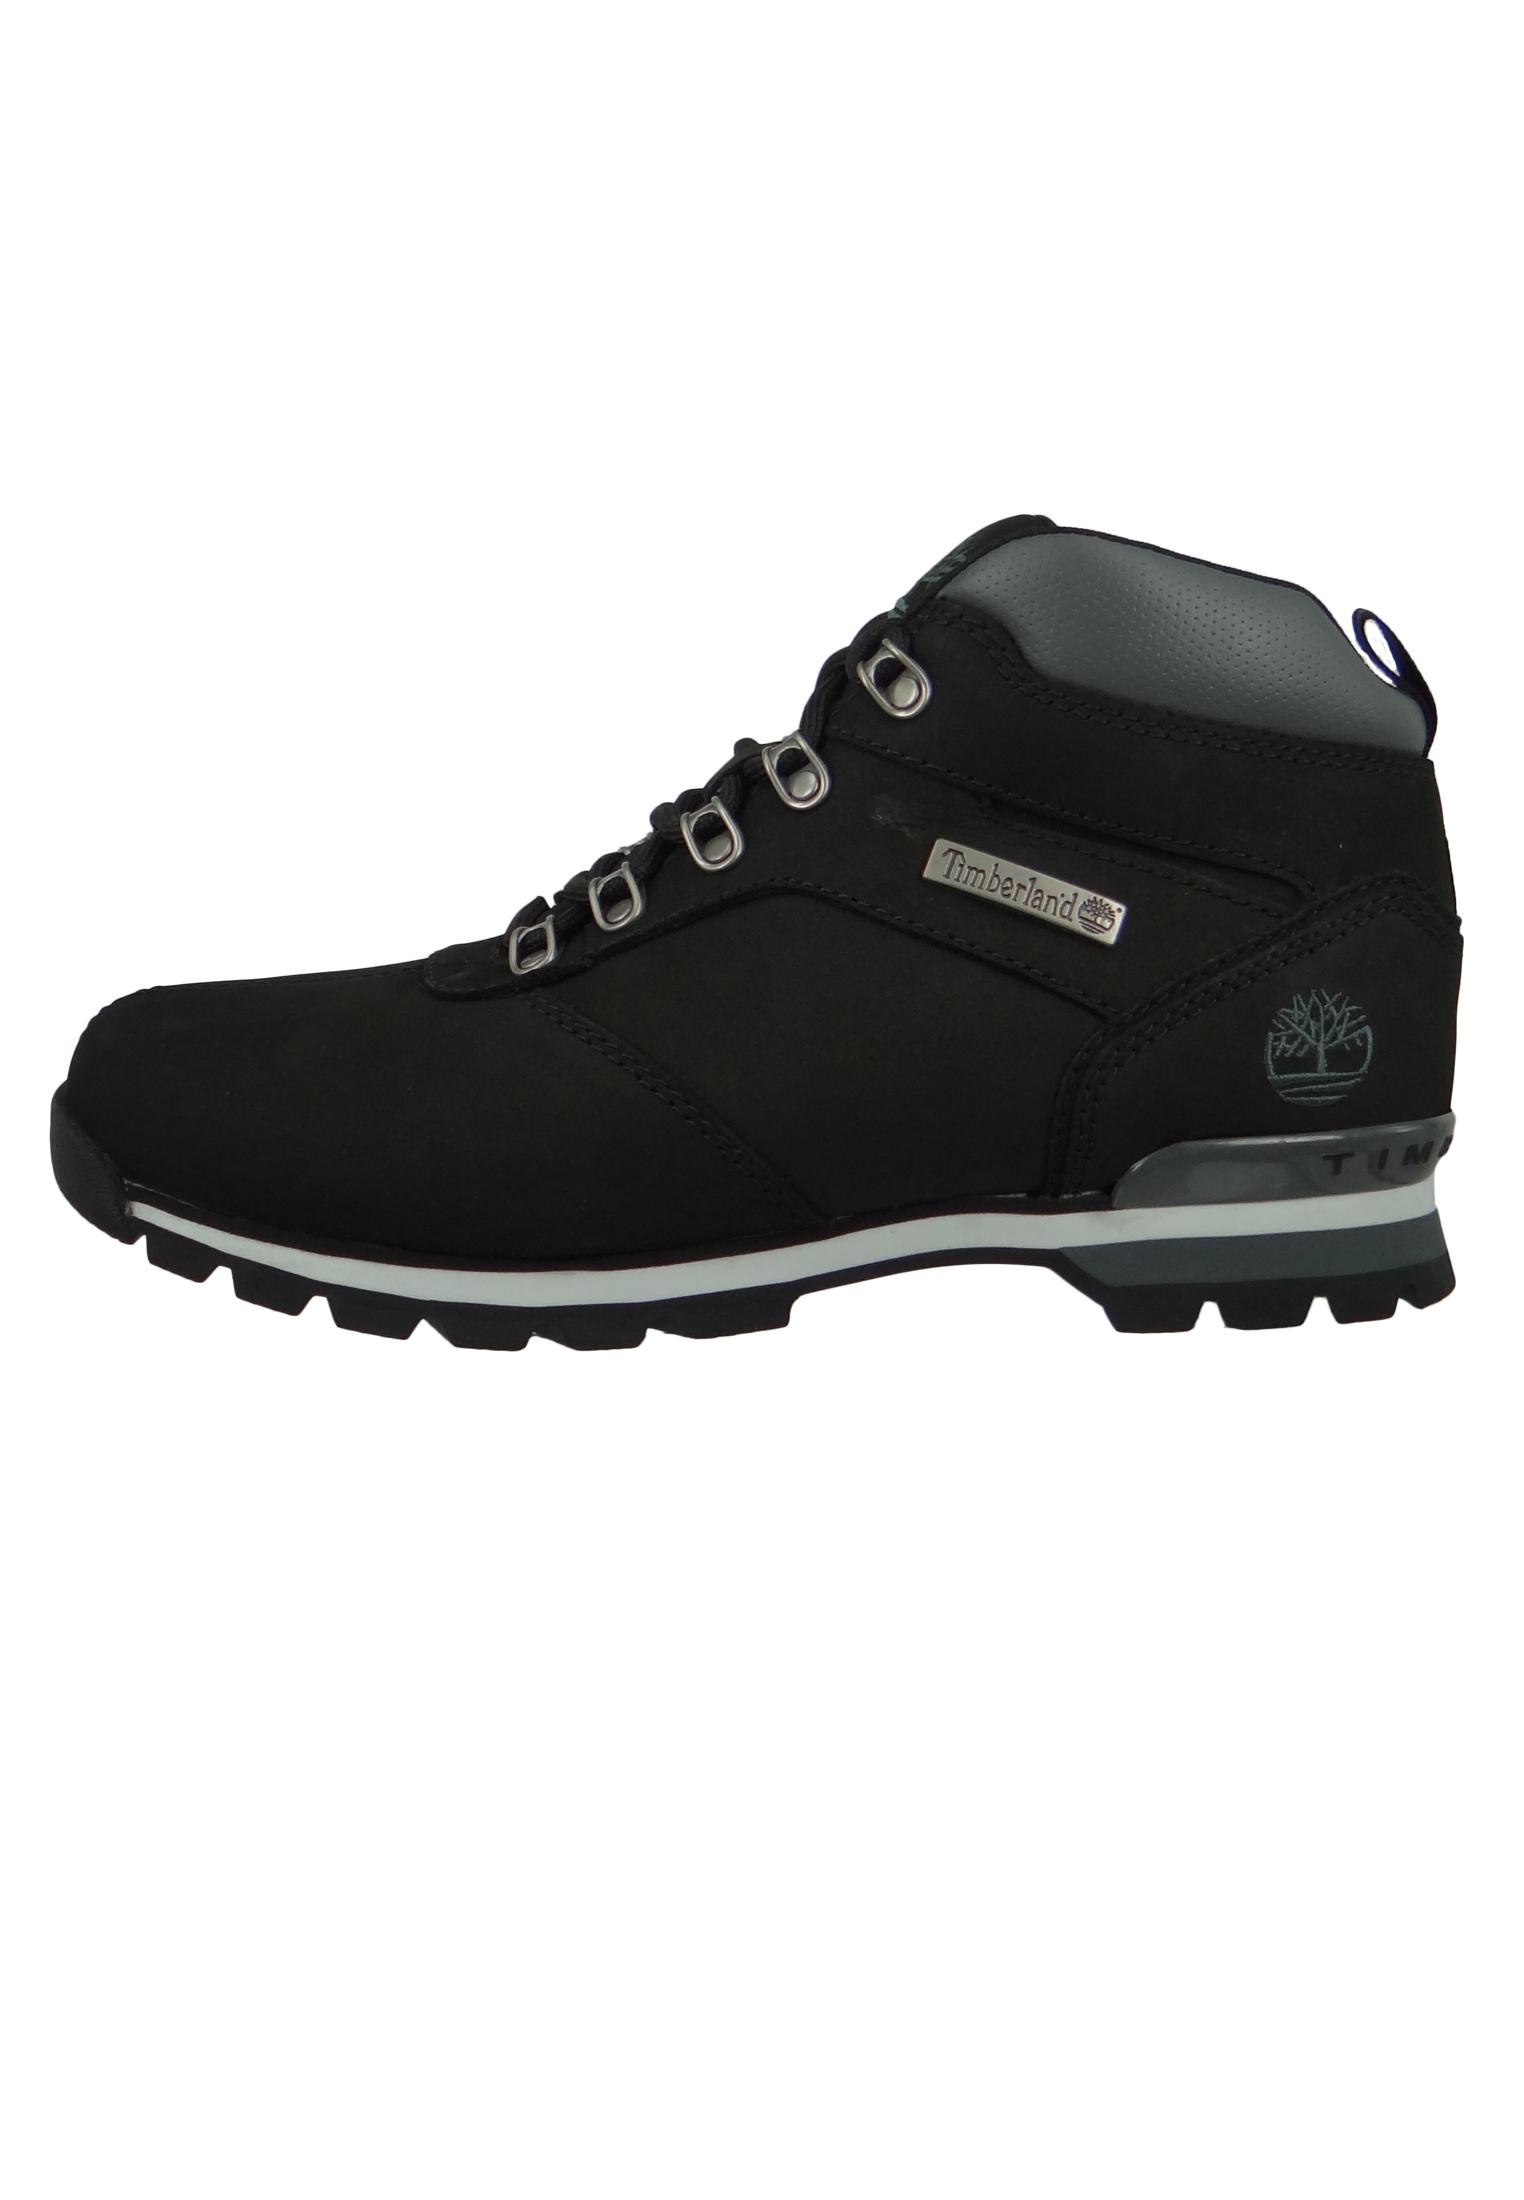 Timberland 6161R Splitrock 2 Hiker Herren Leder Wanderschuhe Black Nubuck Schwarz